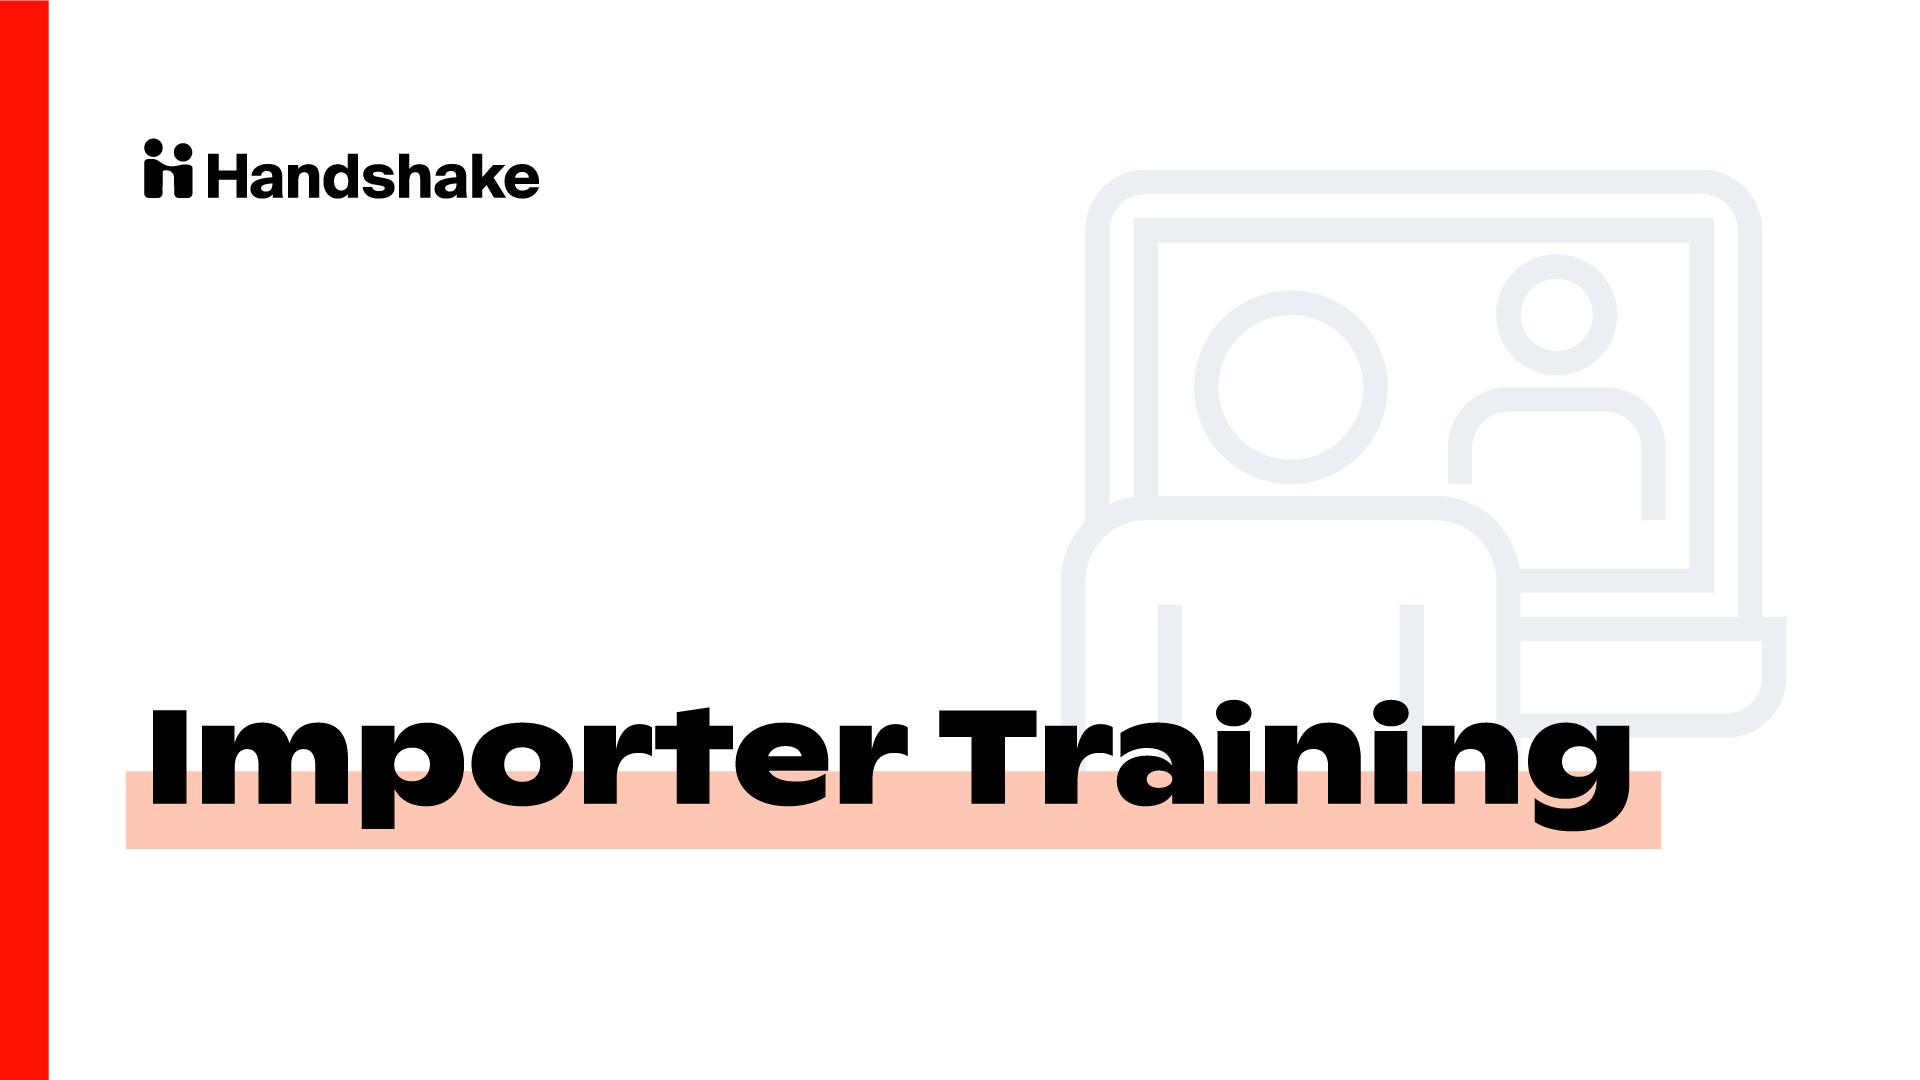 Importer Training